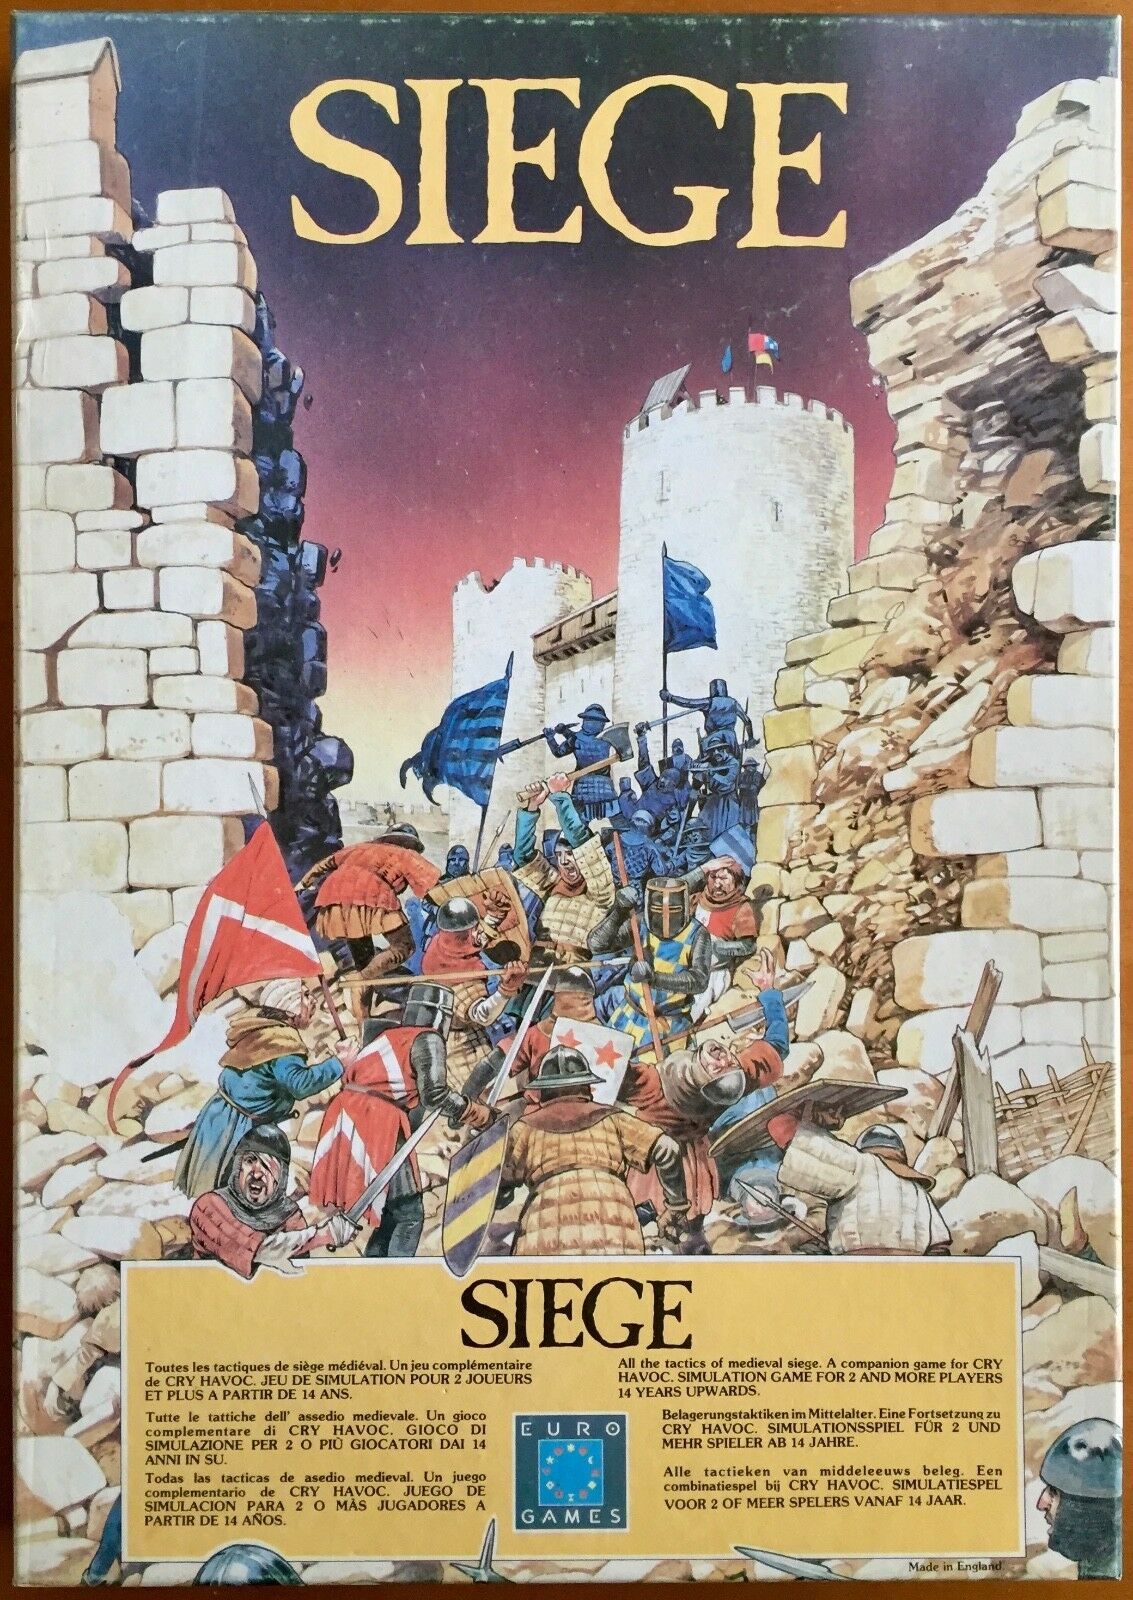 Siege - Eurogames 1983 - Pari al nuovo - UNPUNCHED